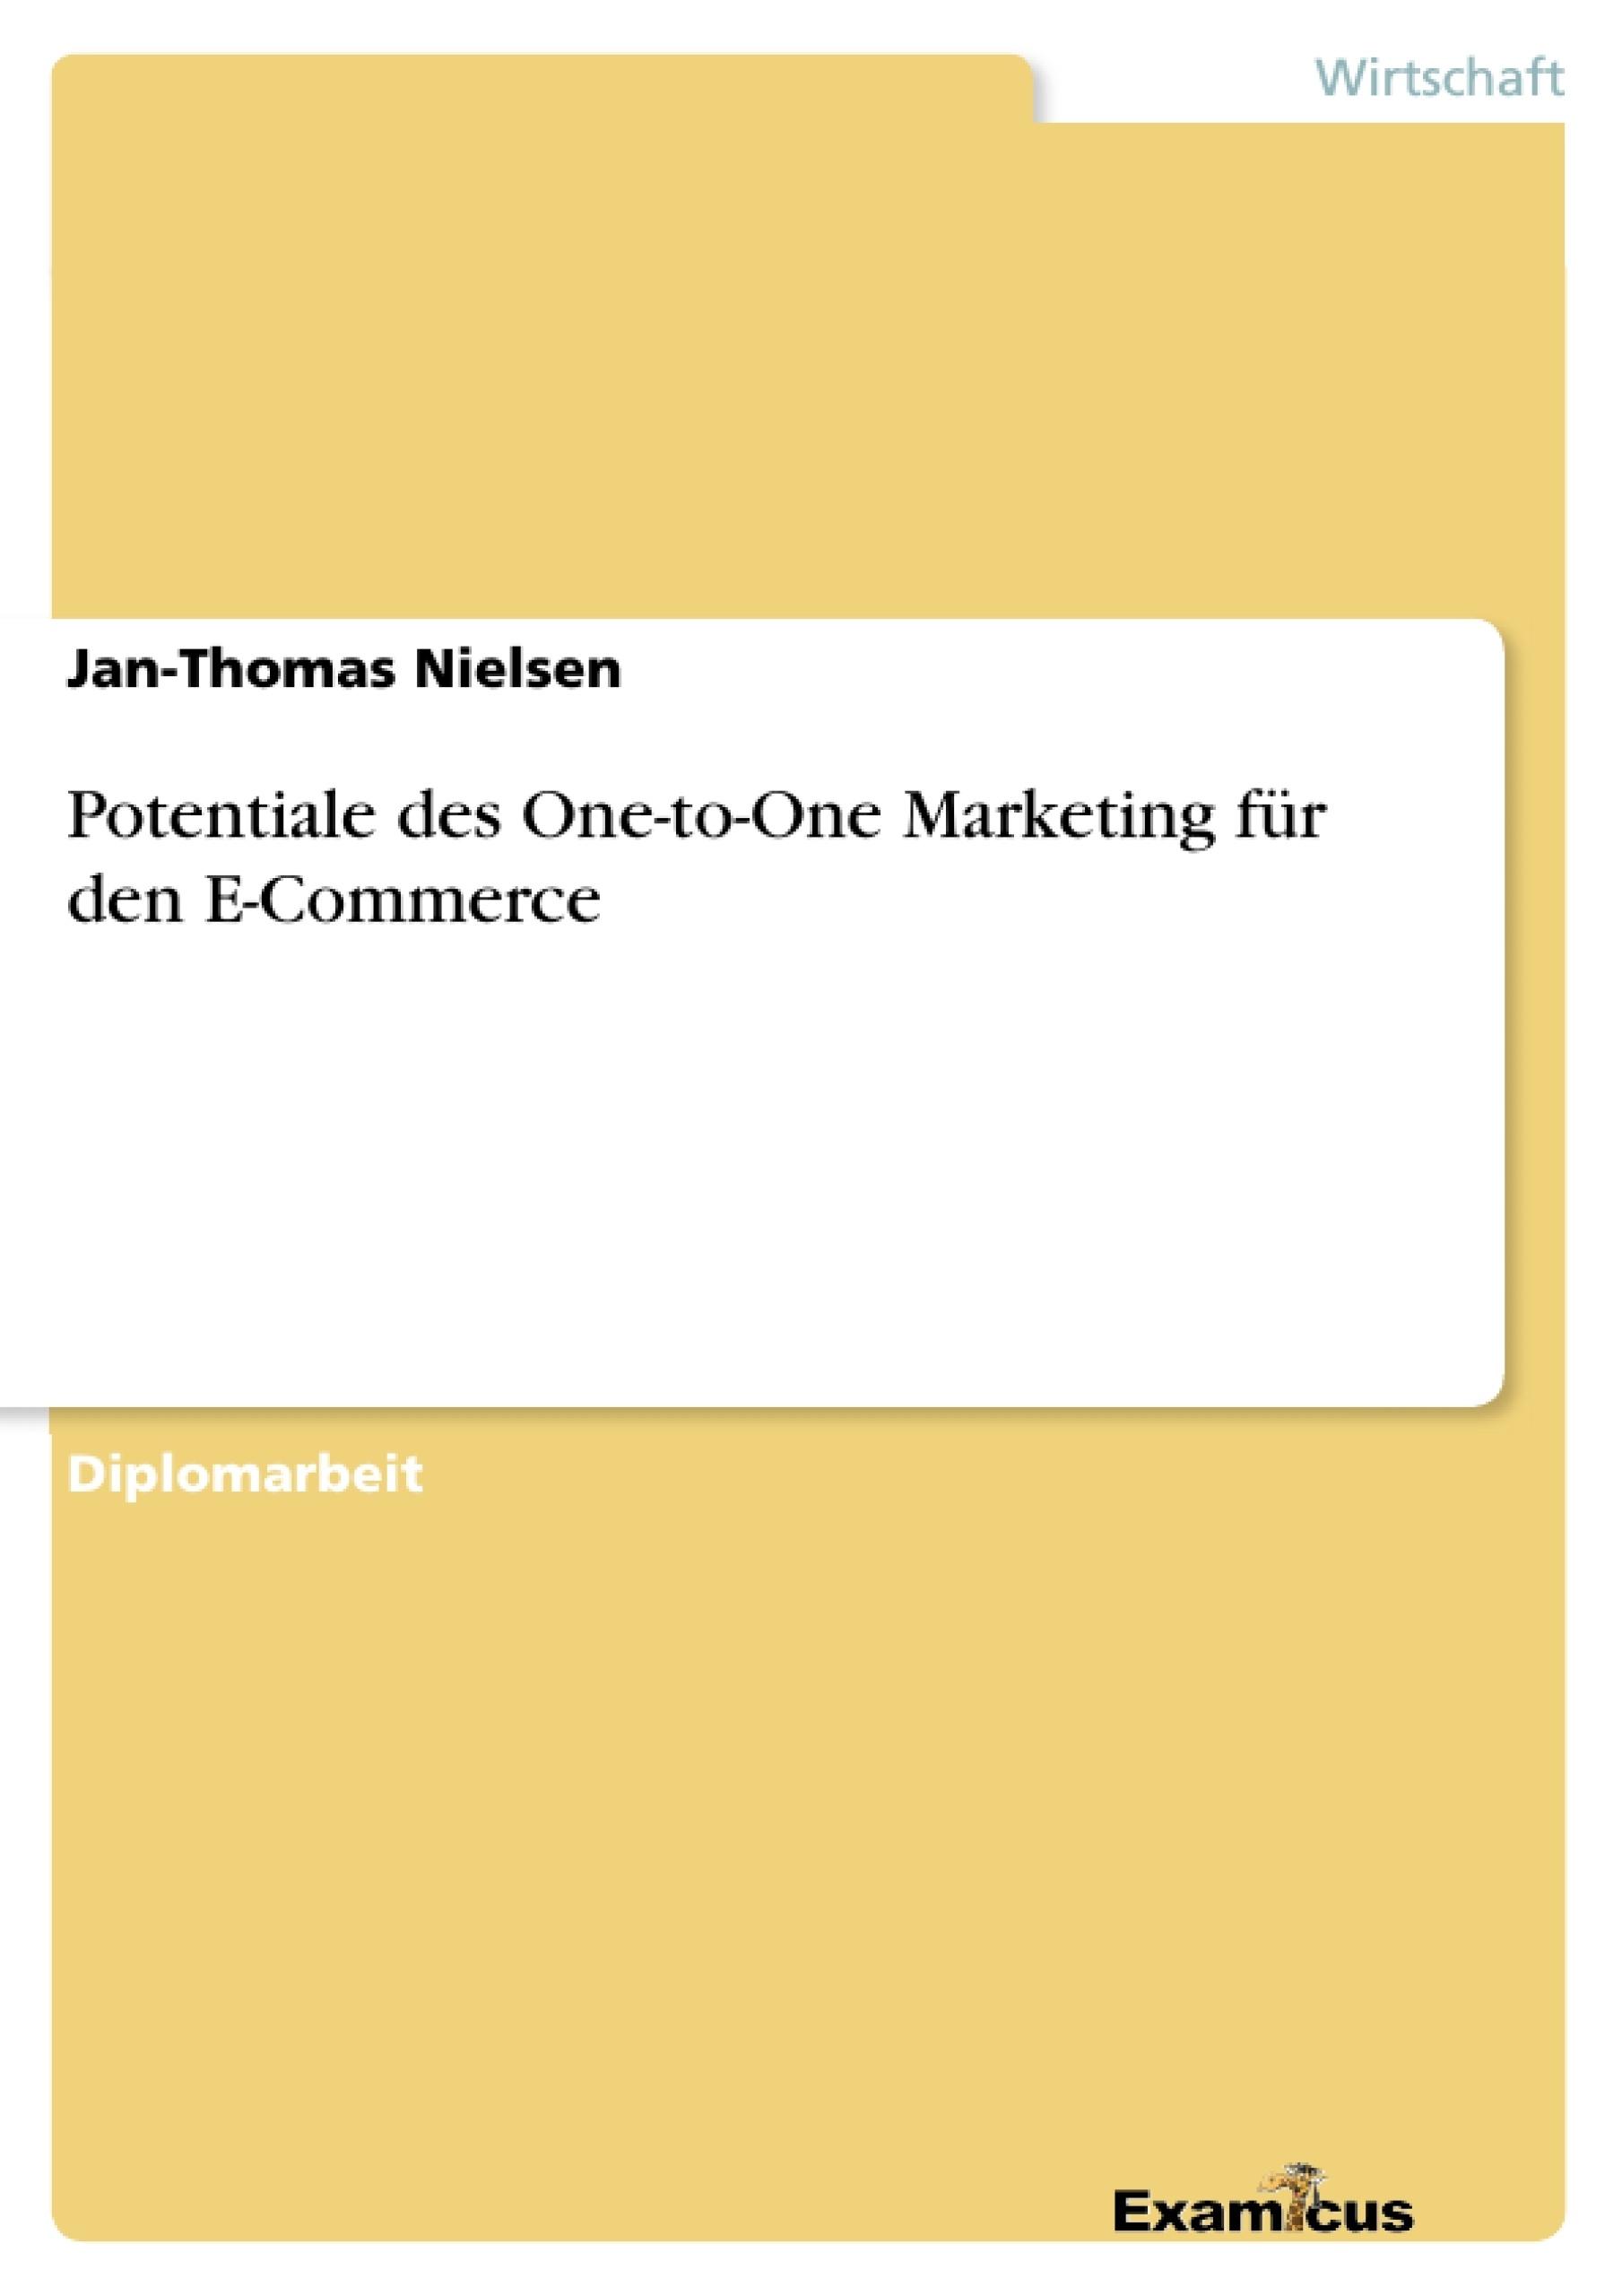 Titel: Potentiale des One-to-One Marketing für den E-Commerce